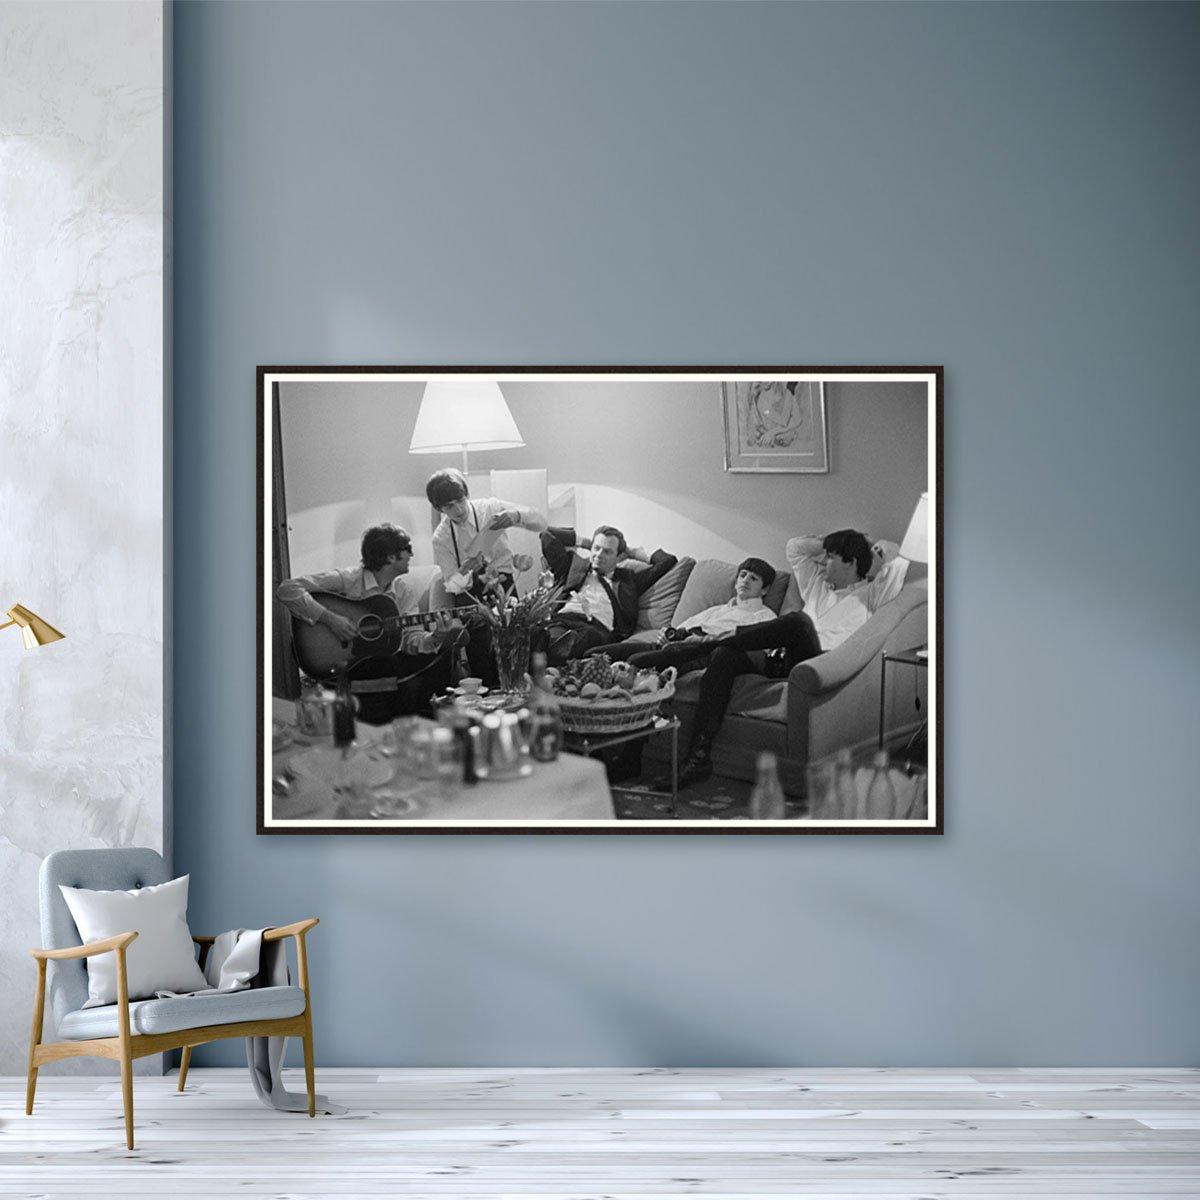 The Beatles In Paris by Harry Benson